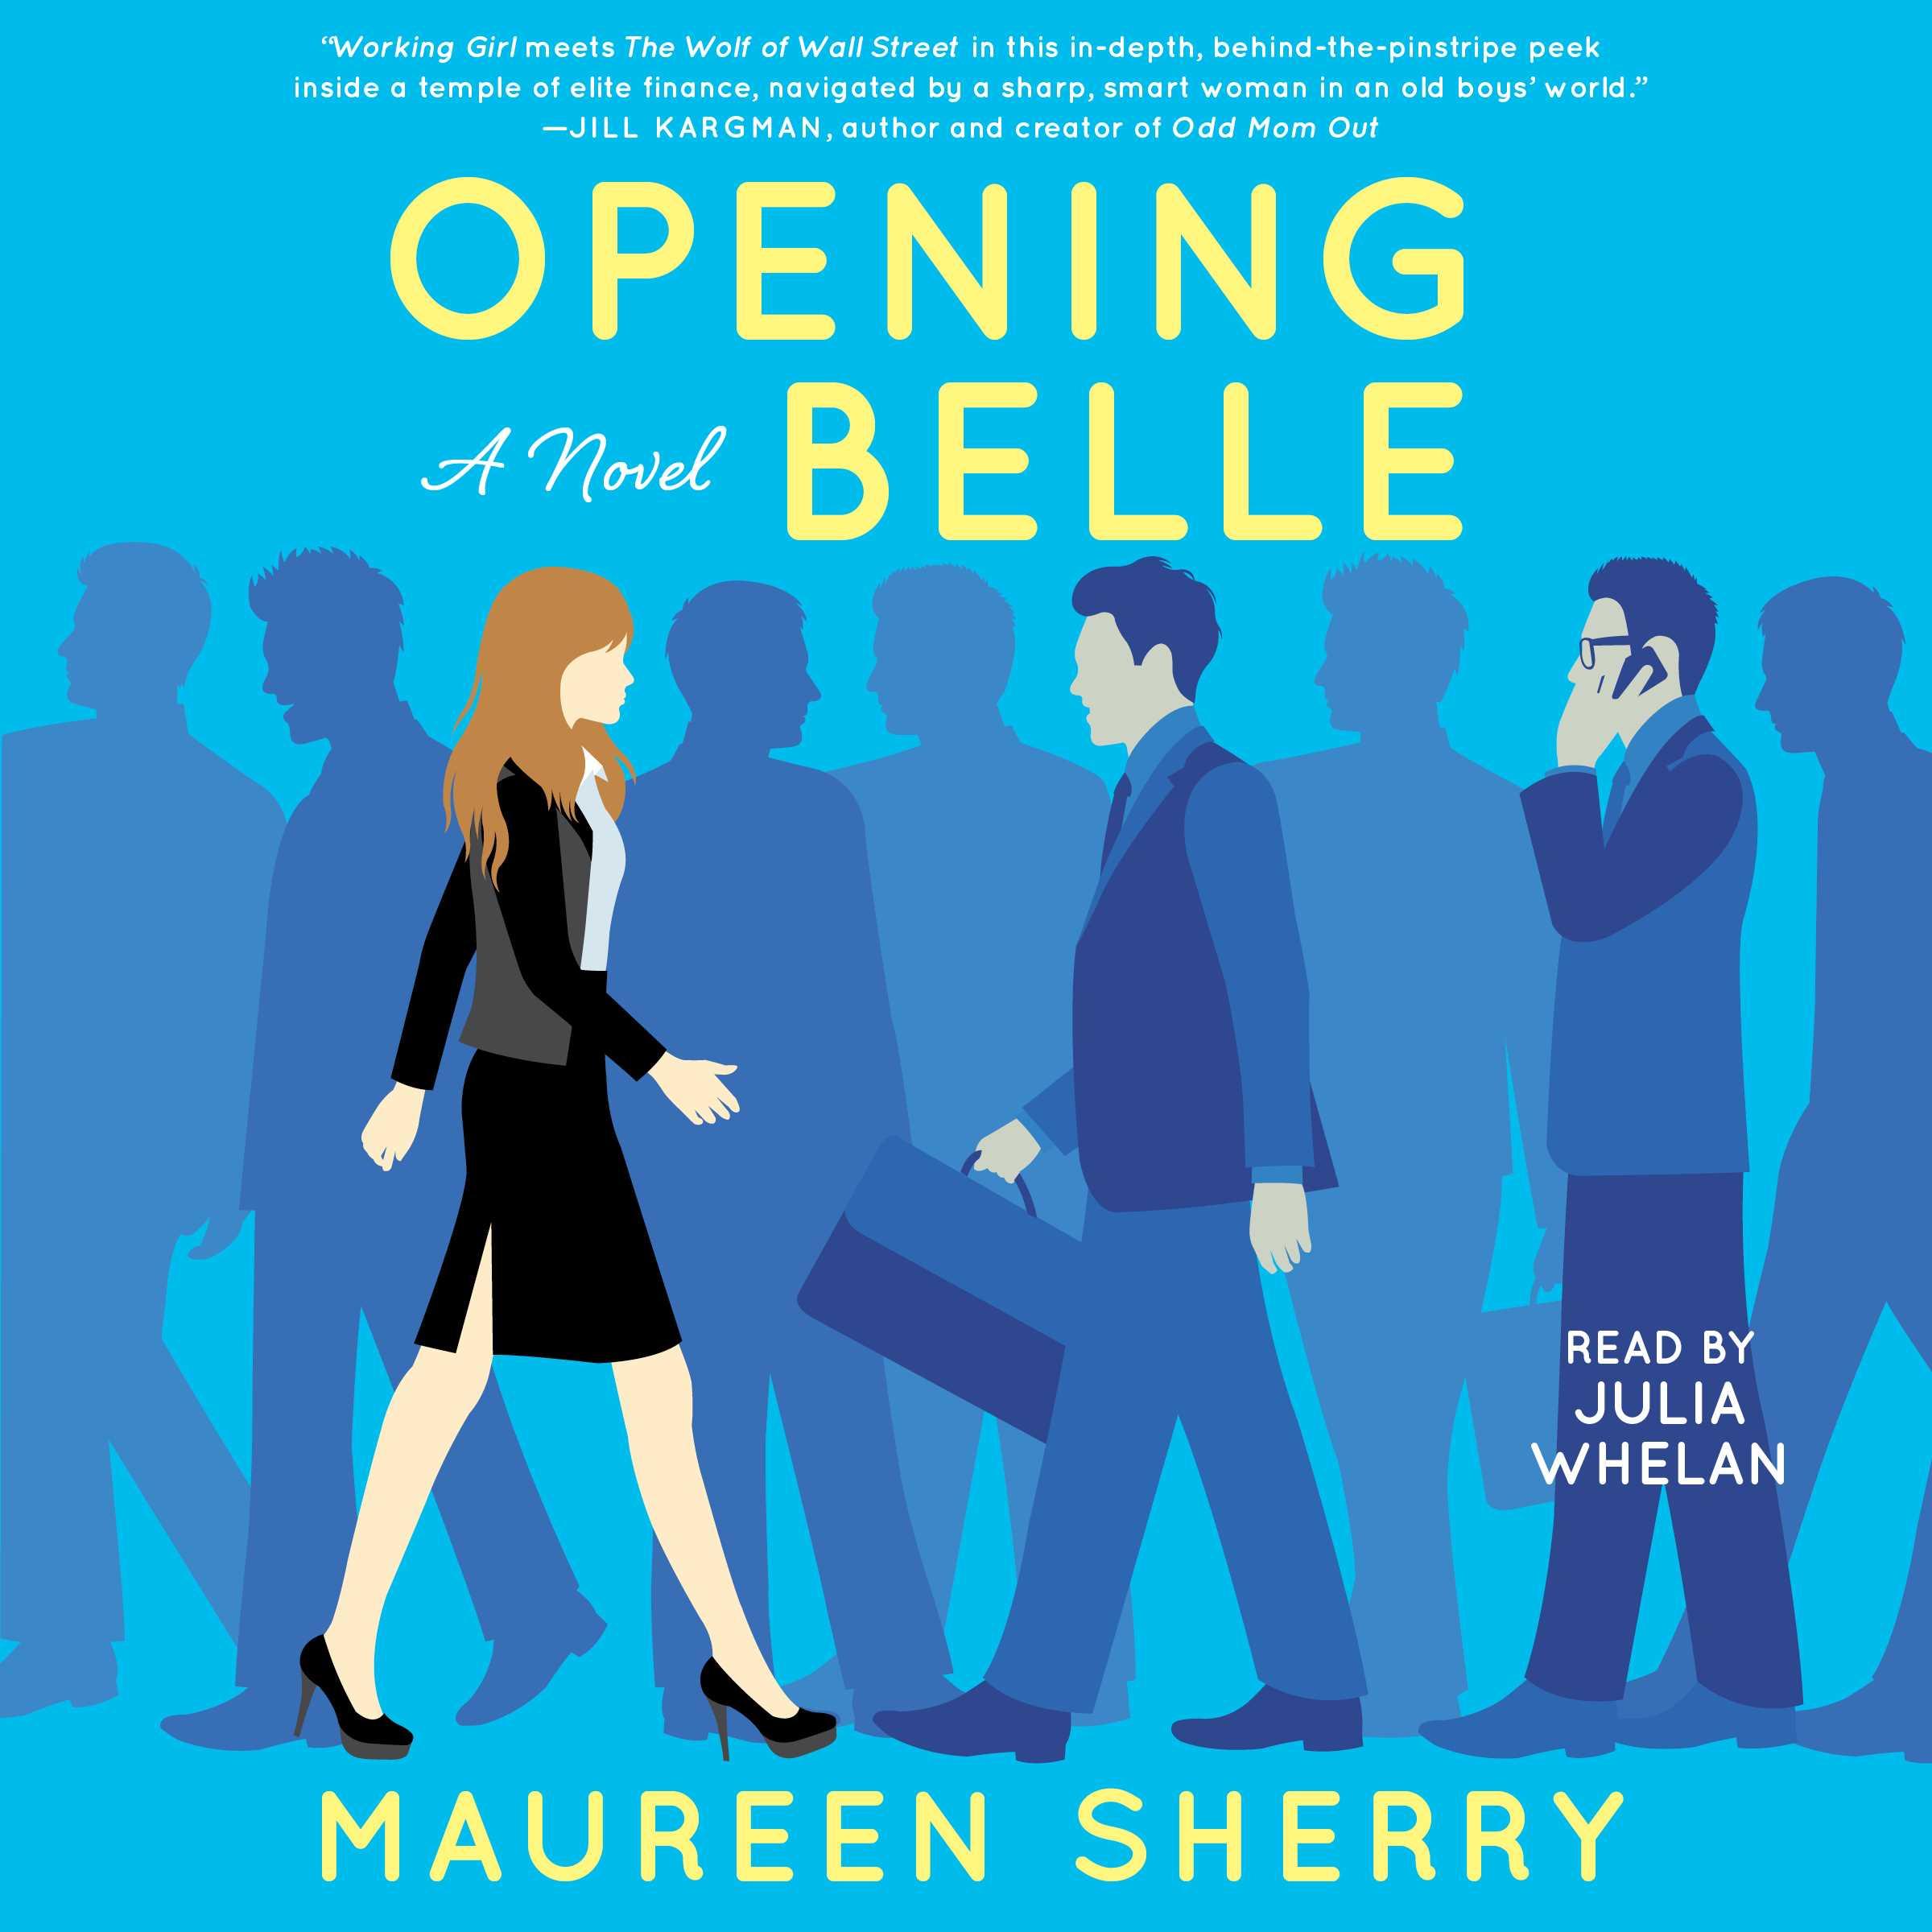 Opening belle 9781442397774 hr